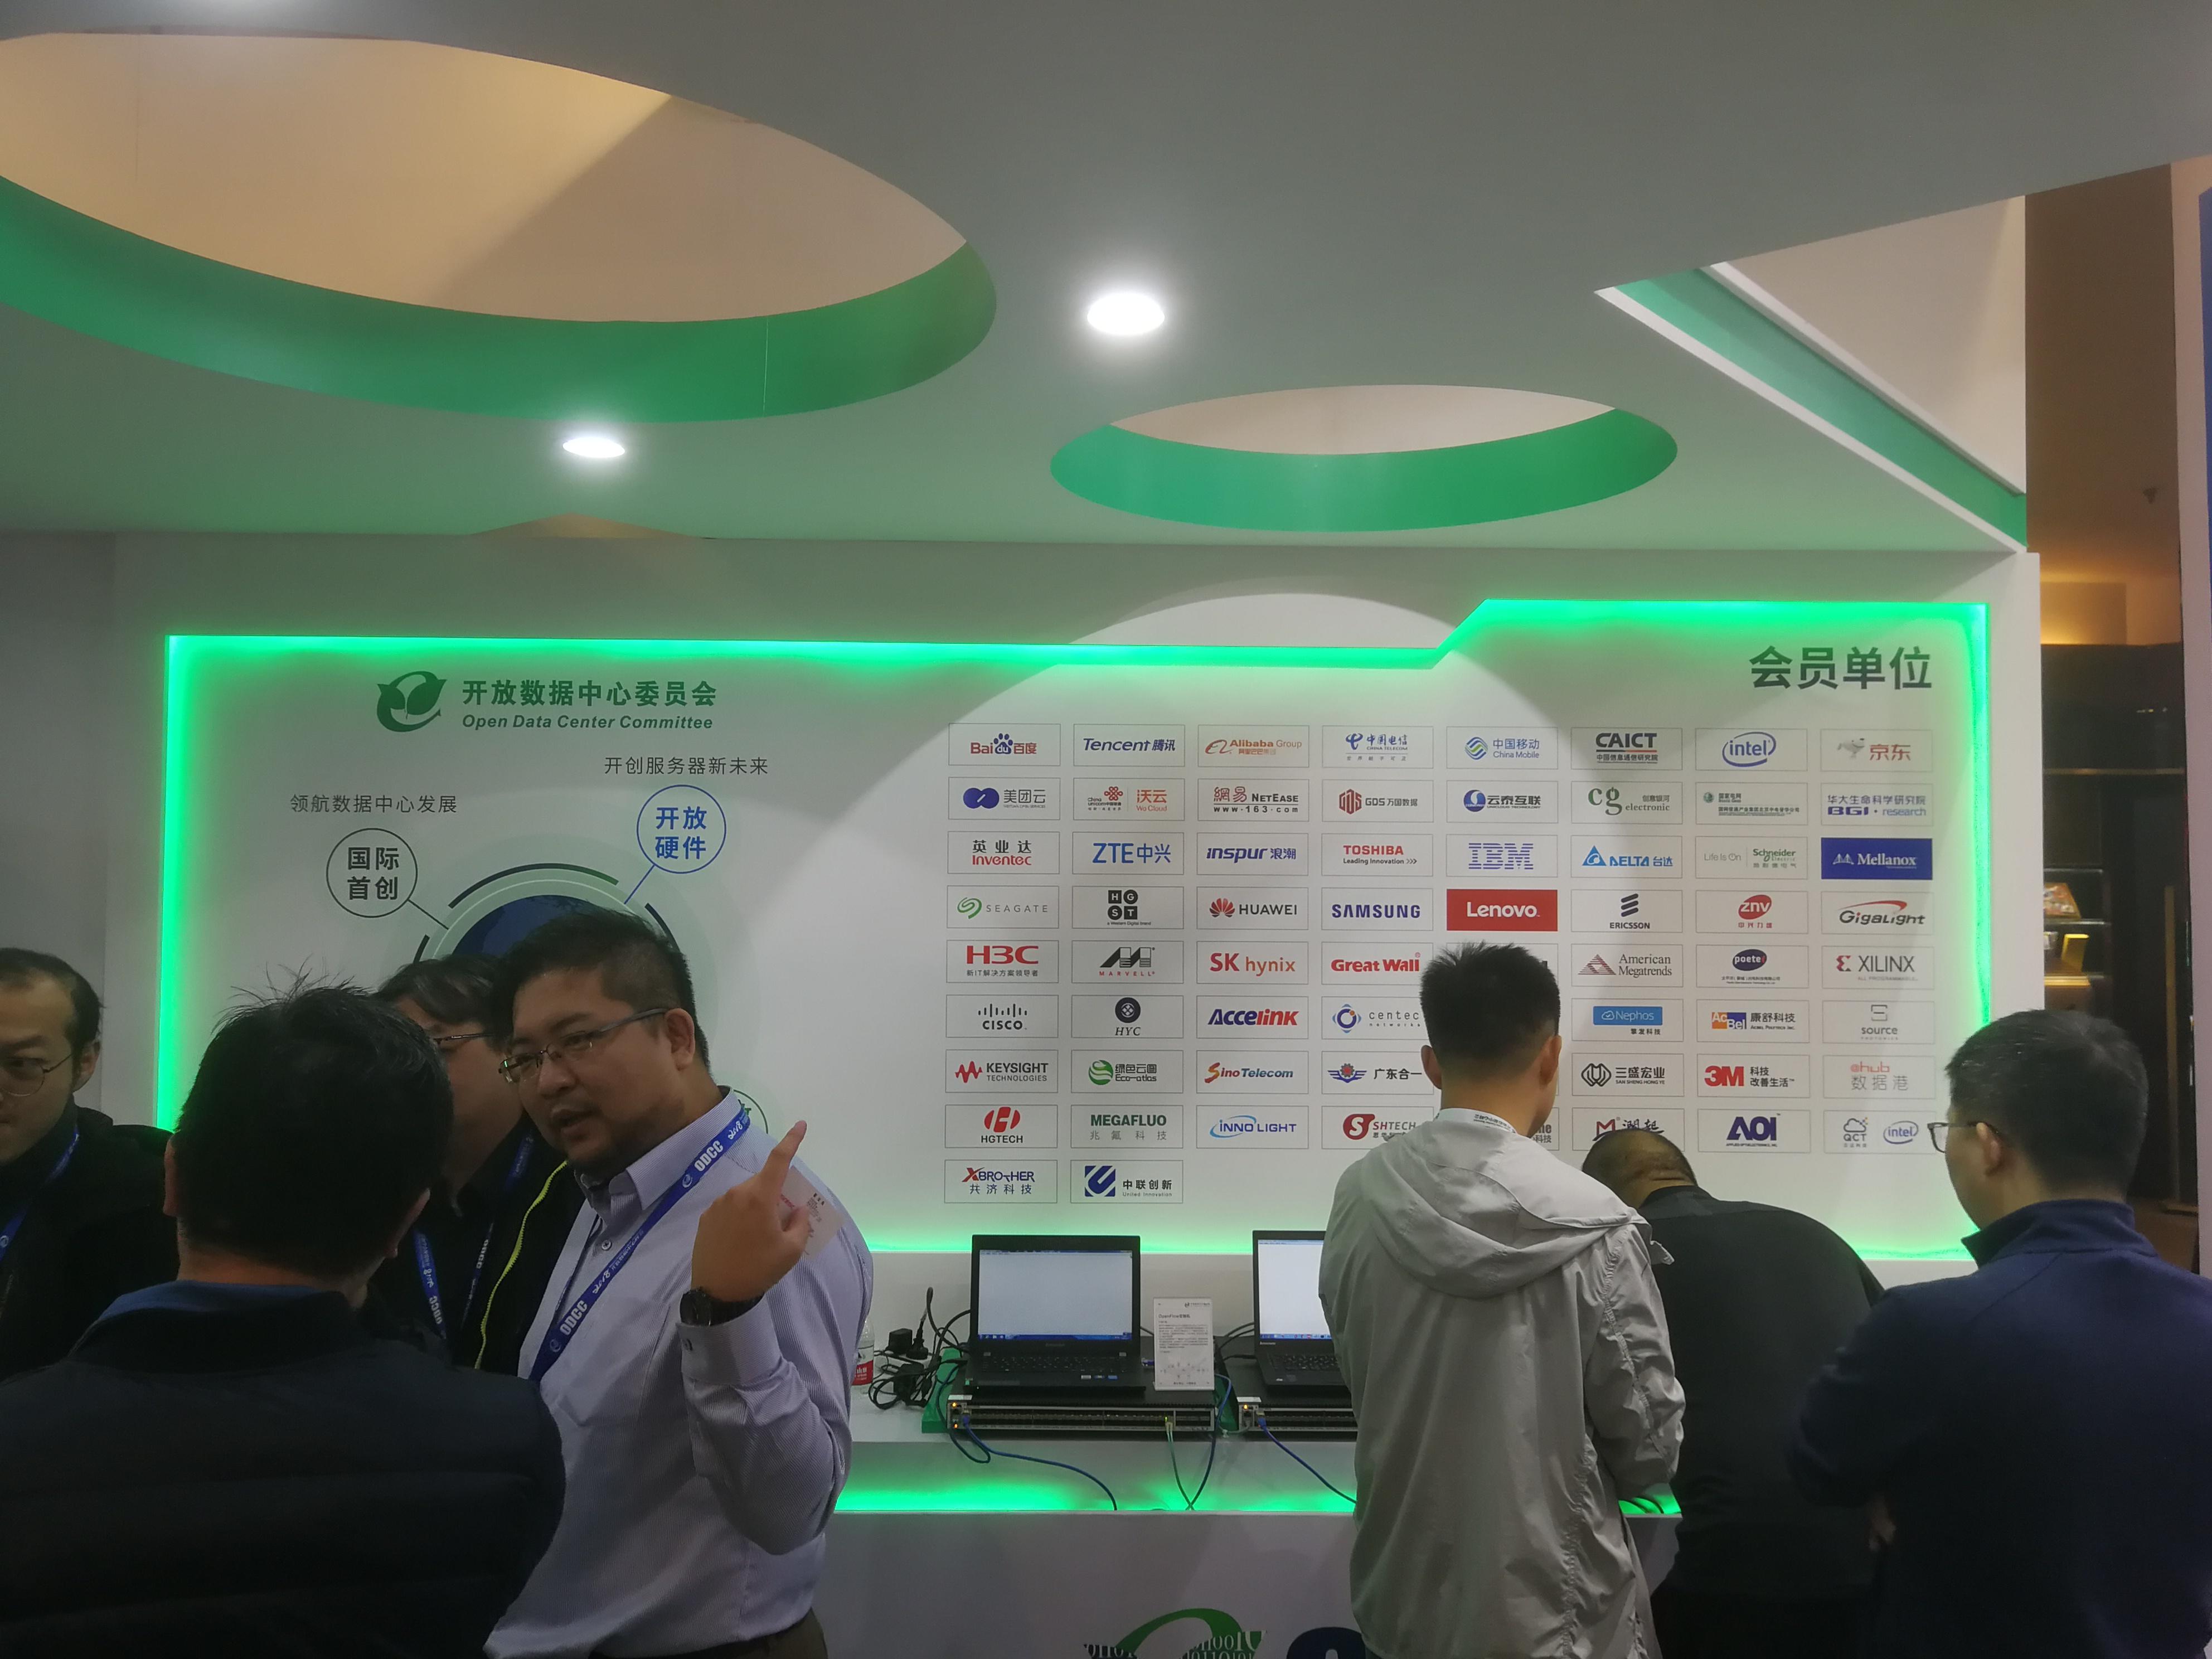 Gigalight في ODCC 2018